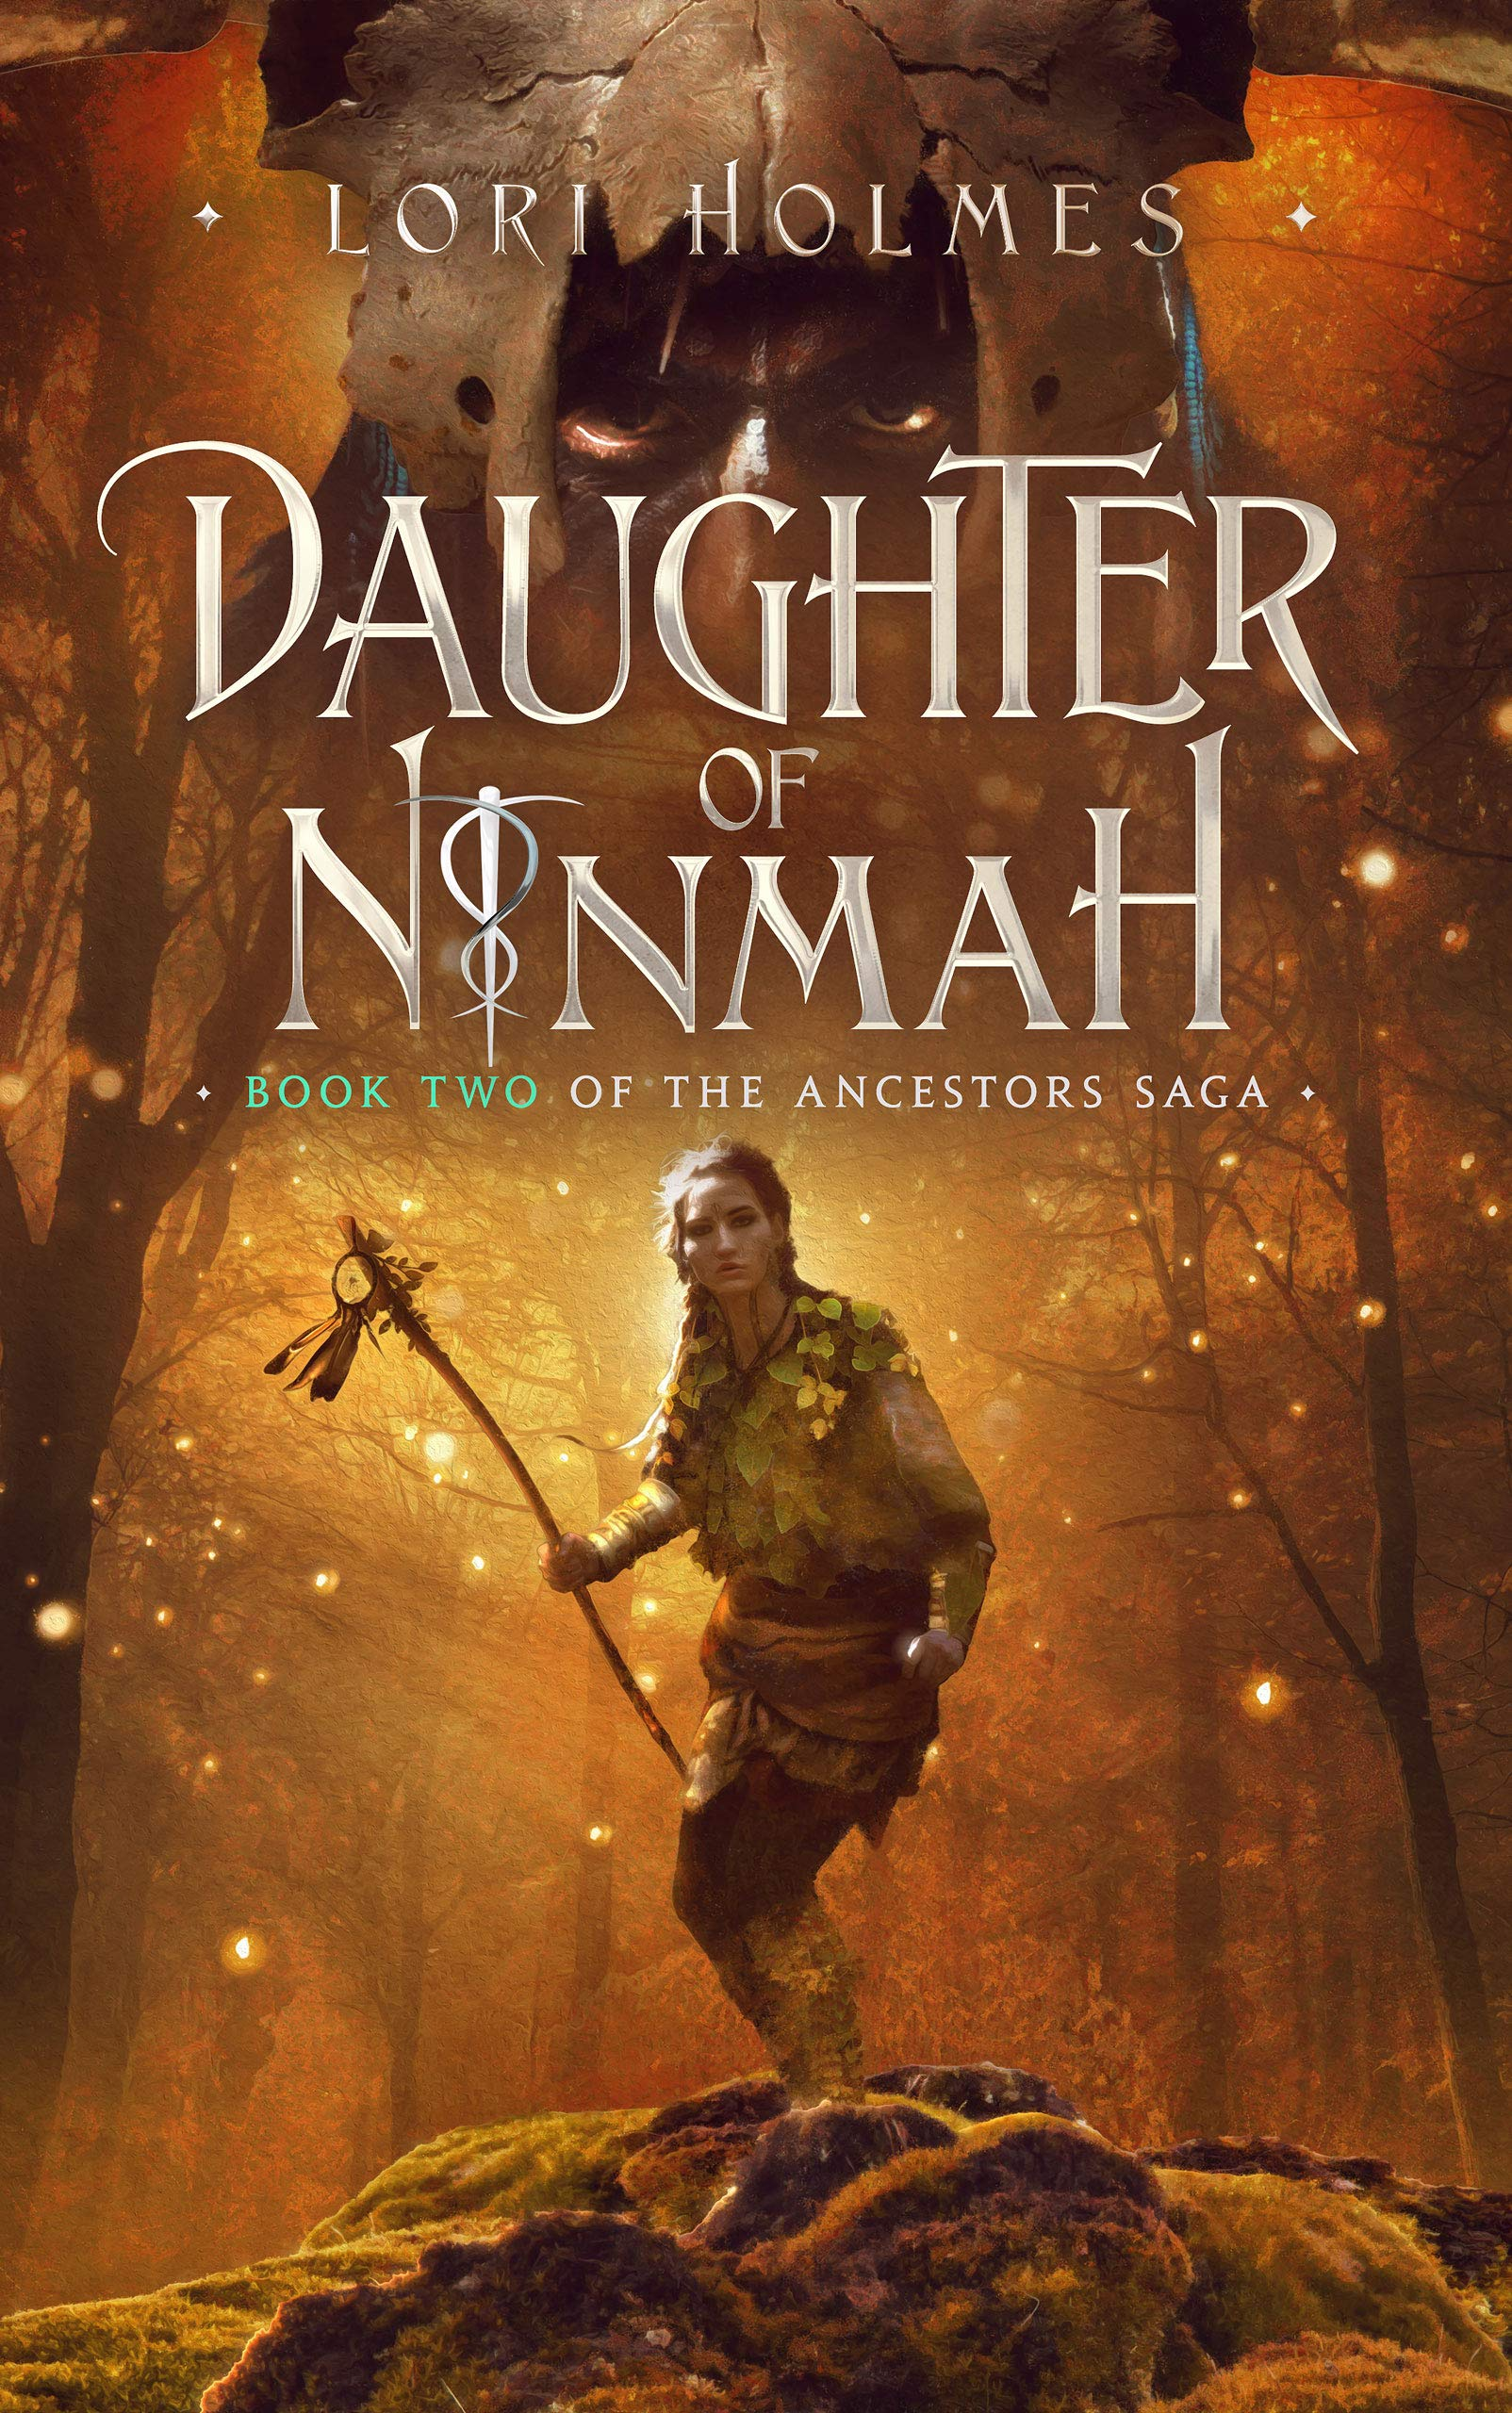 Daughter of Ninmah: A Fantasy Romance Series (The Ancestors Saga, #2)